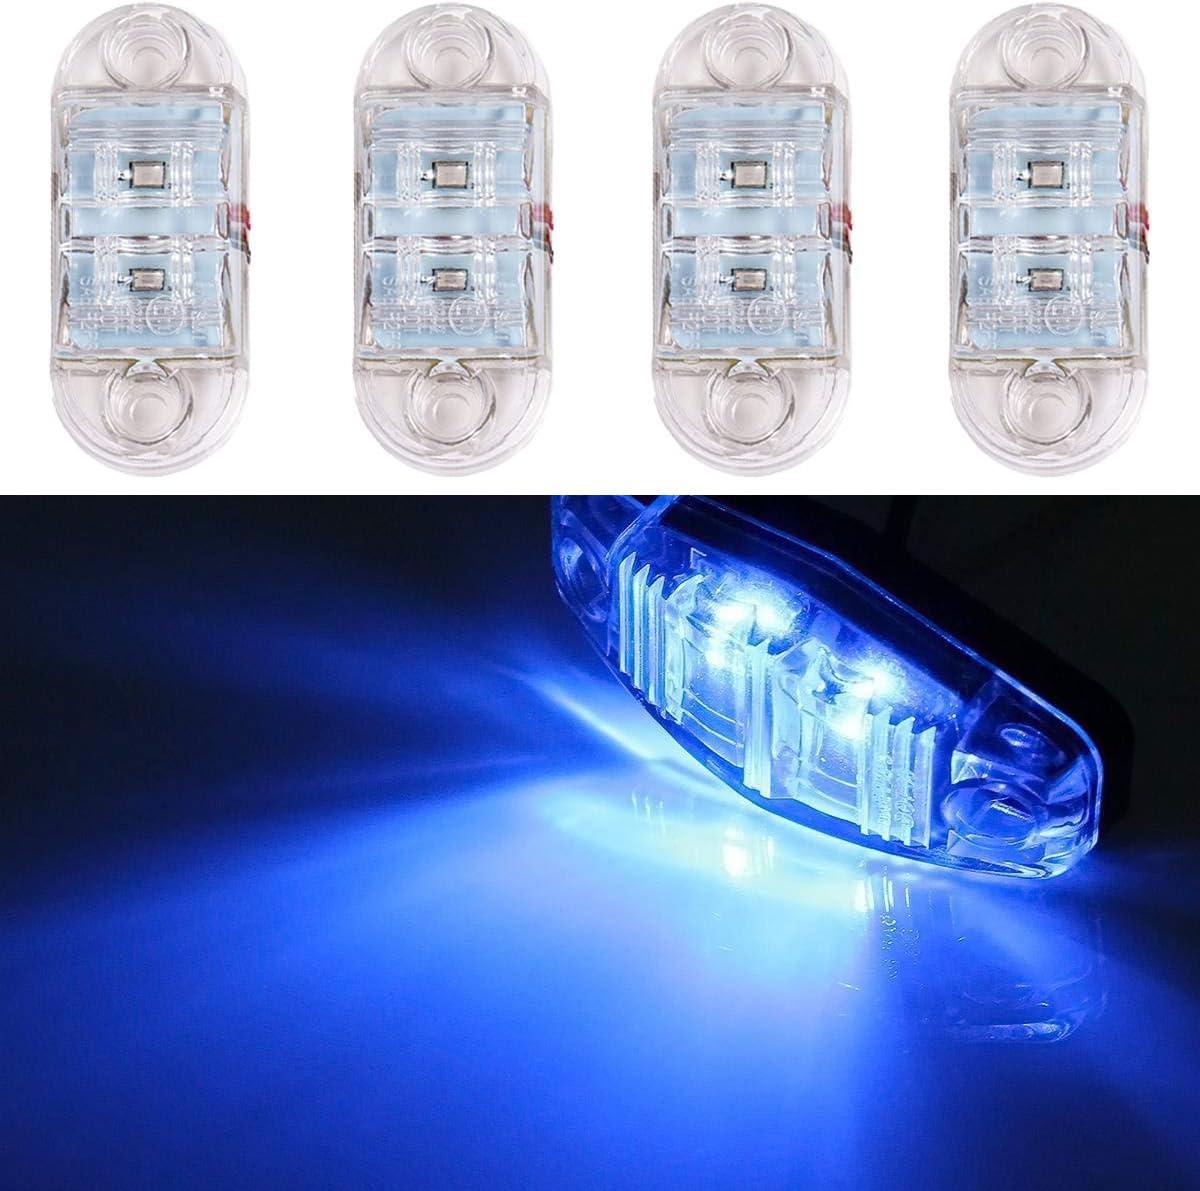 WildAuto Side Marker LED Lights for Trucks,12V 24V Clear 2.5inch Trailer Lights for Van Caravan Lorry Car Bus